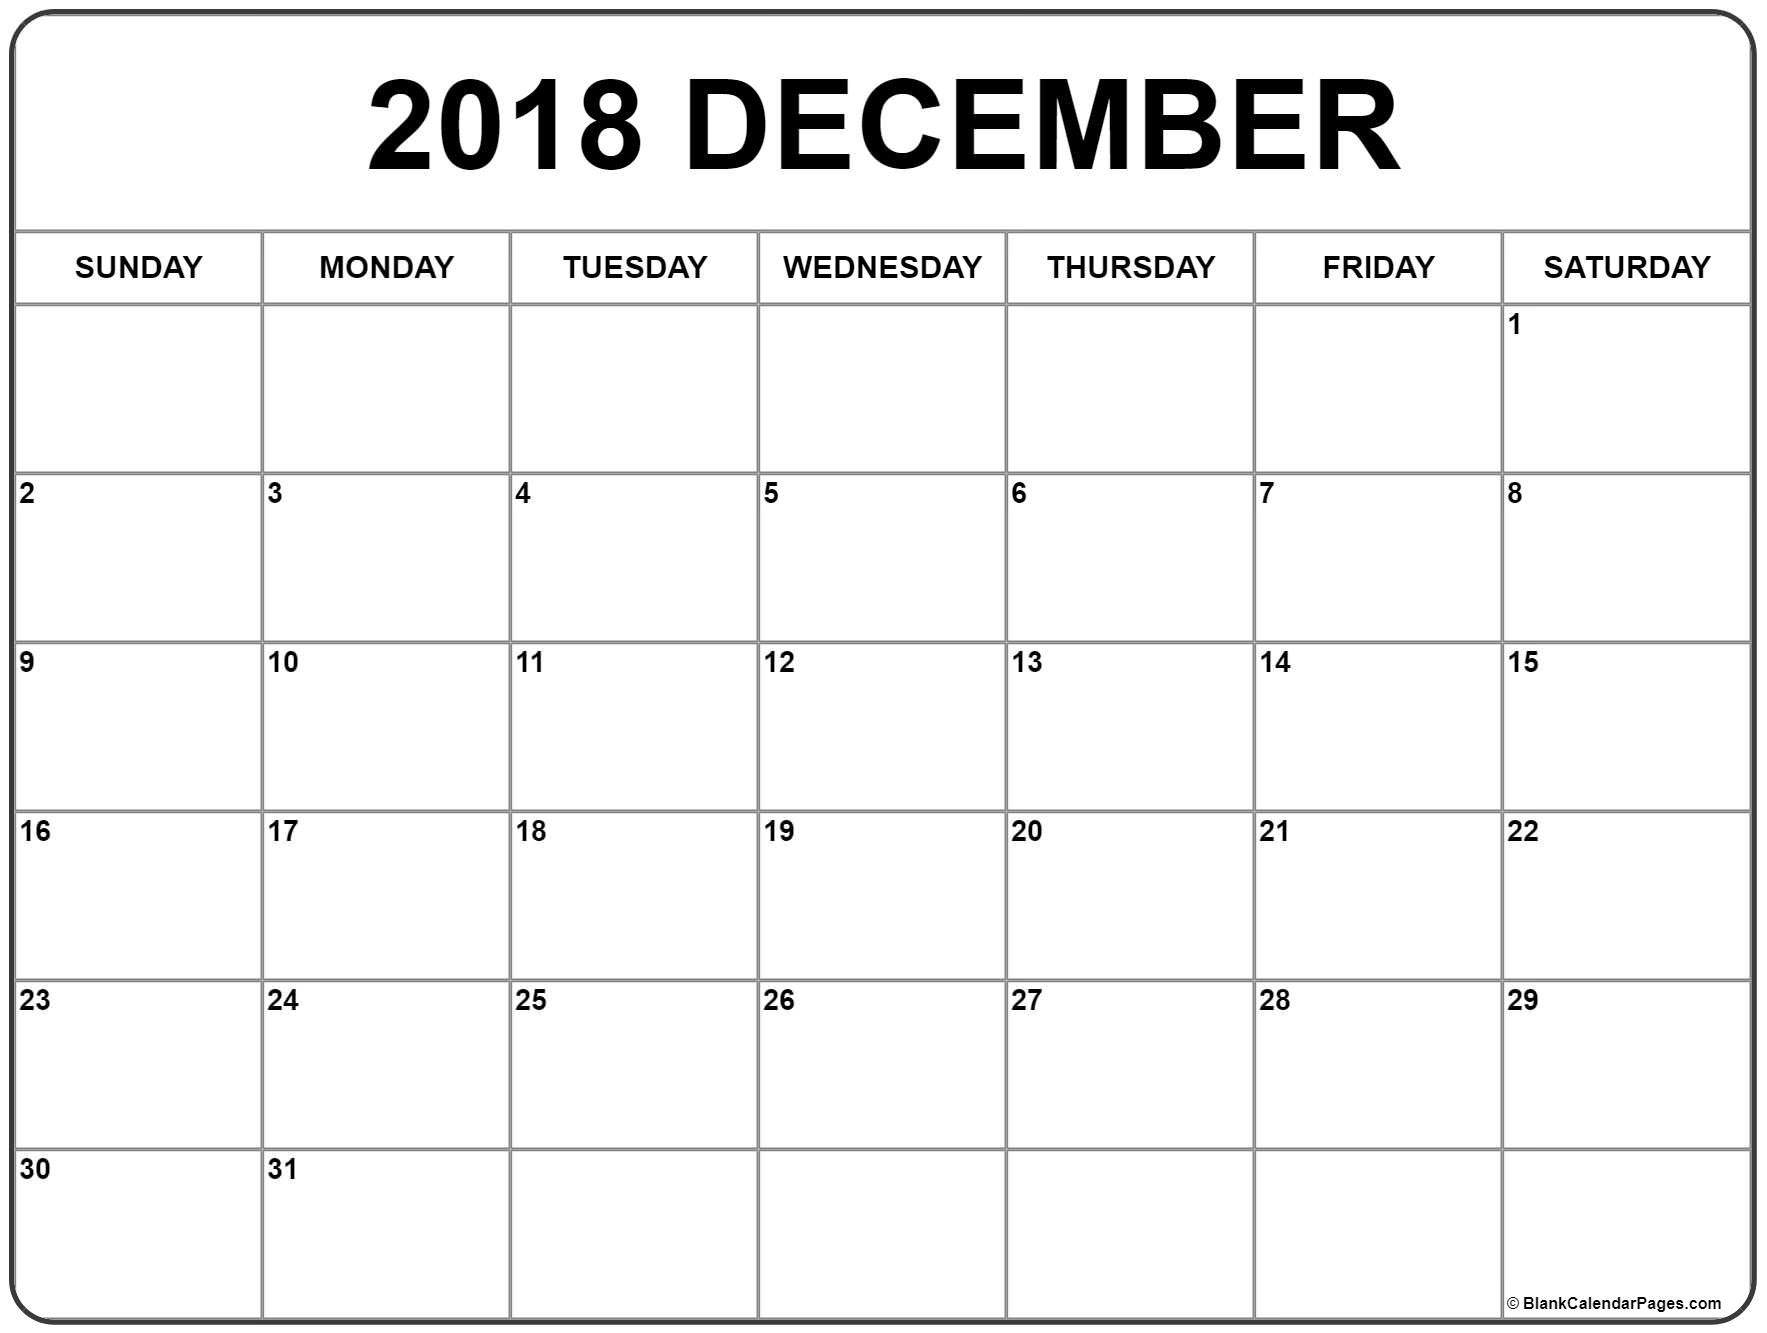 December 2018 Calendar . December 2018 Calendar